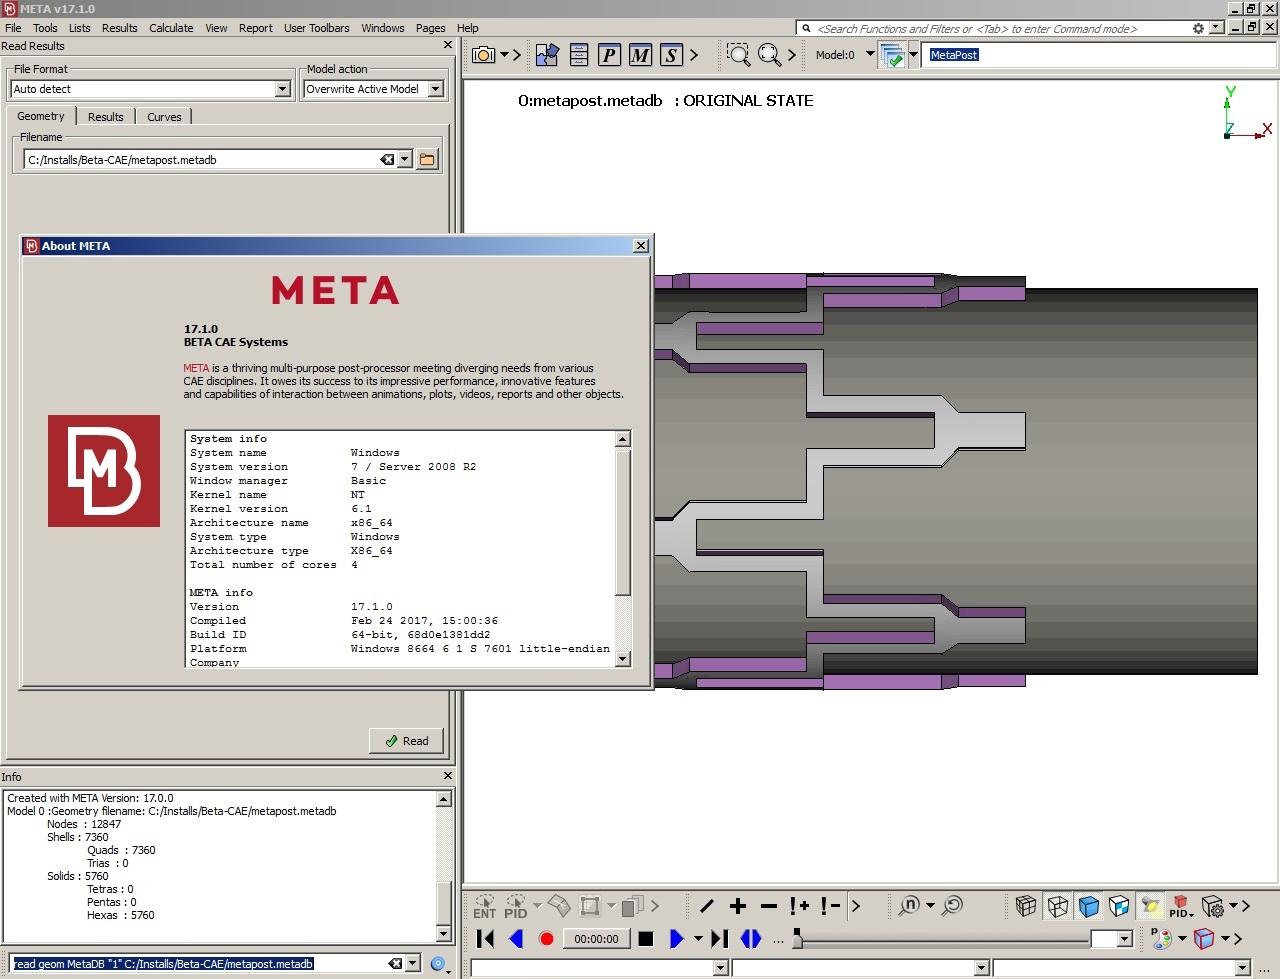 photo BETA CAE Meta Post 17.1.0 64bit full crack